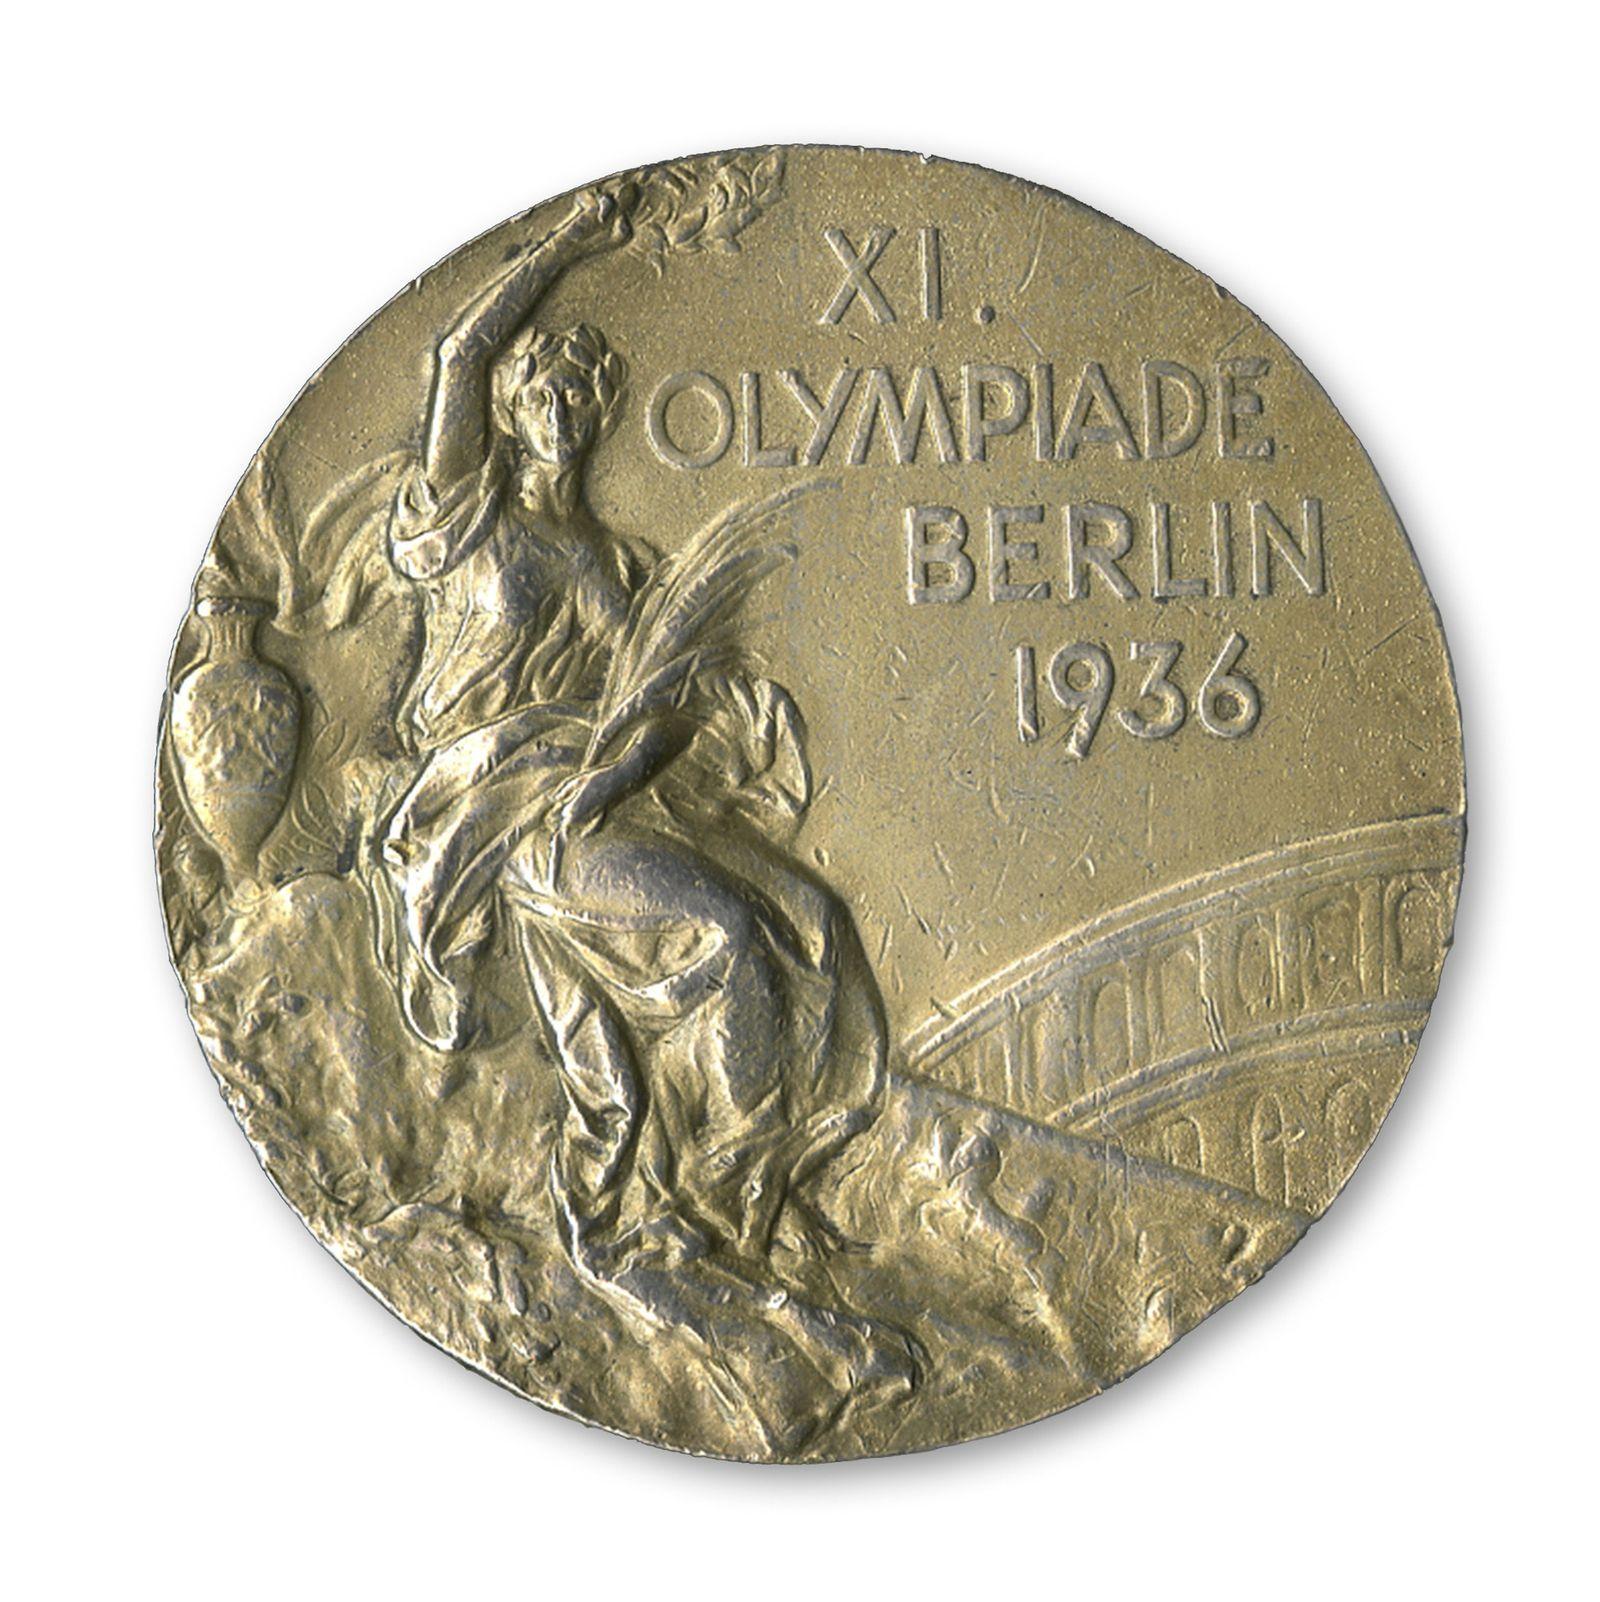 Jesse Owens / Goldmedaille